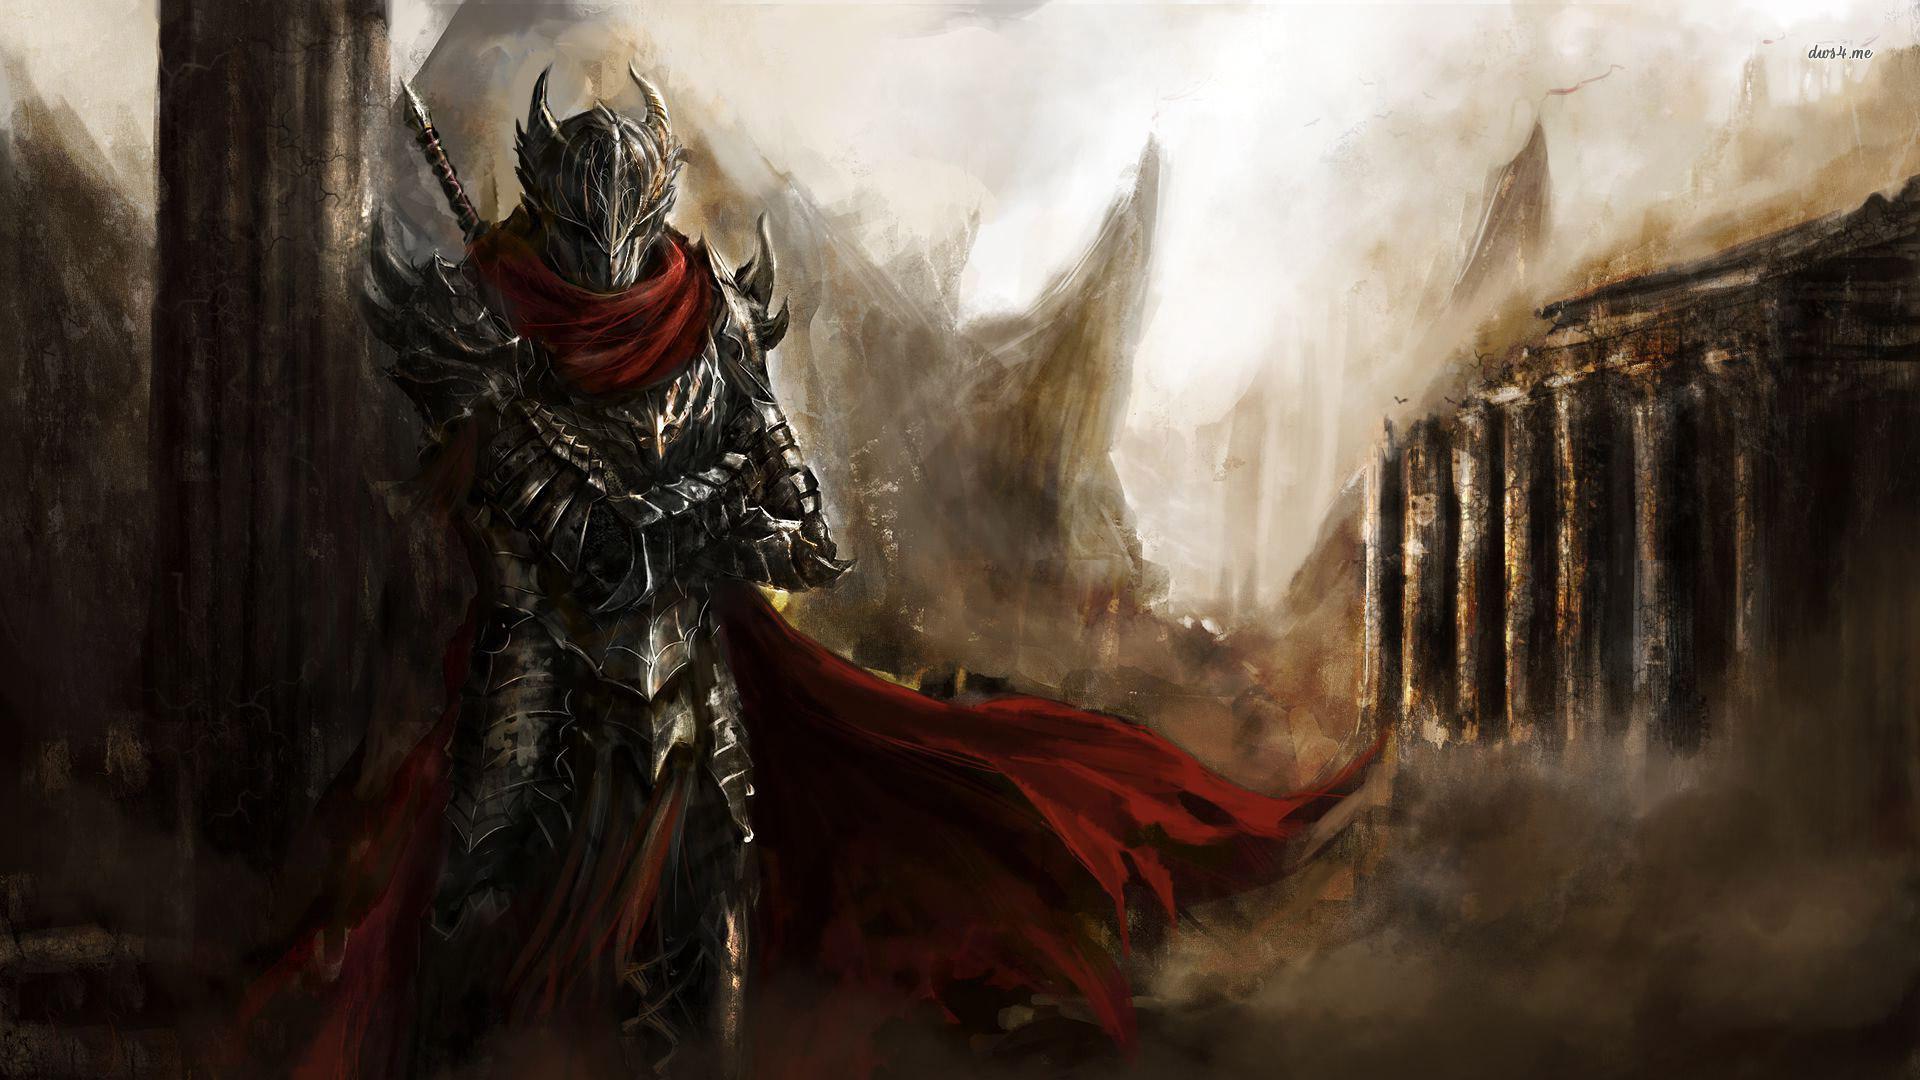 Medieval Black Knight Wallpaper Name: 22956-medieval-warrior-